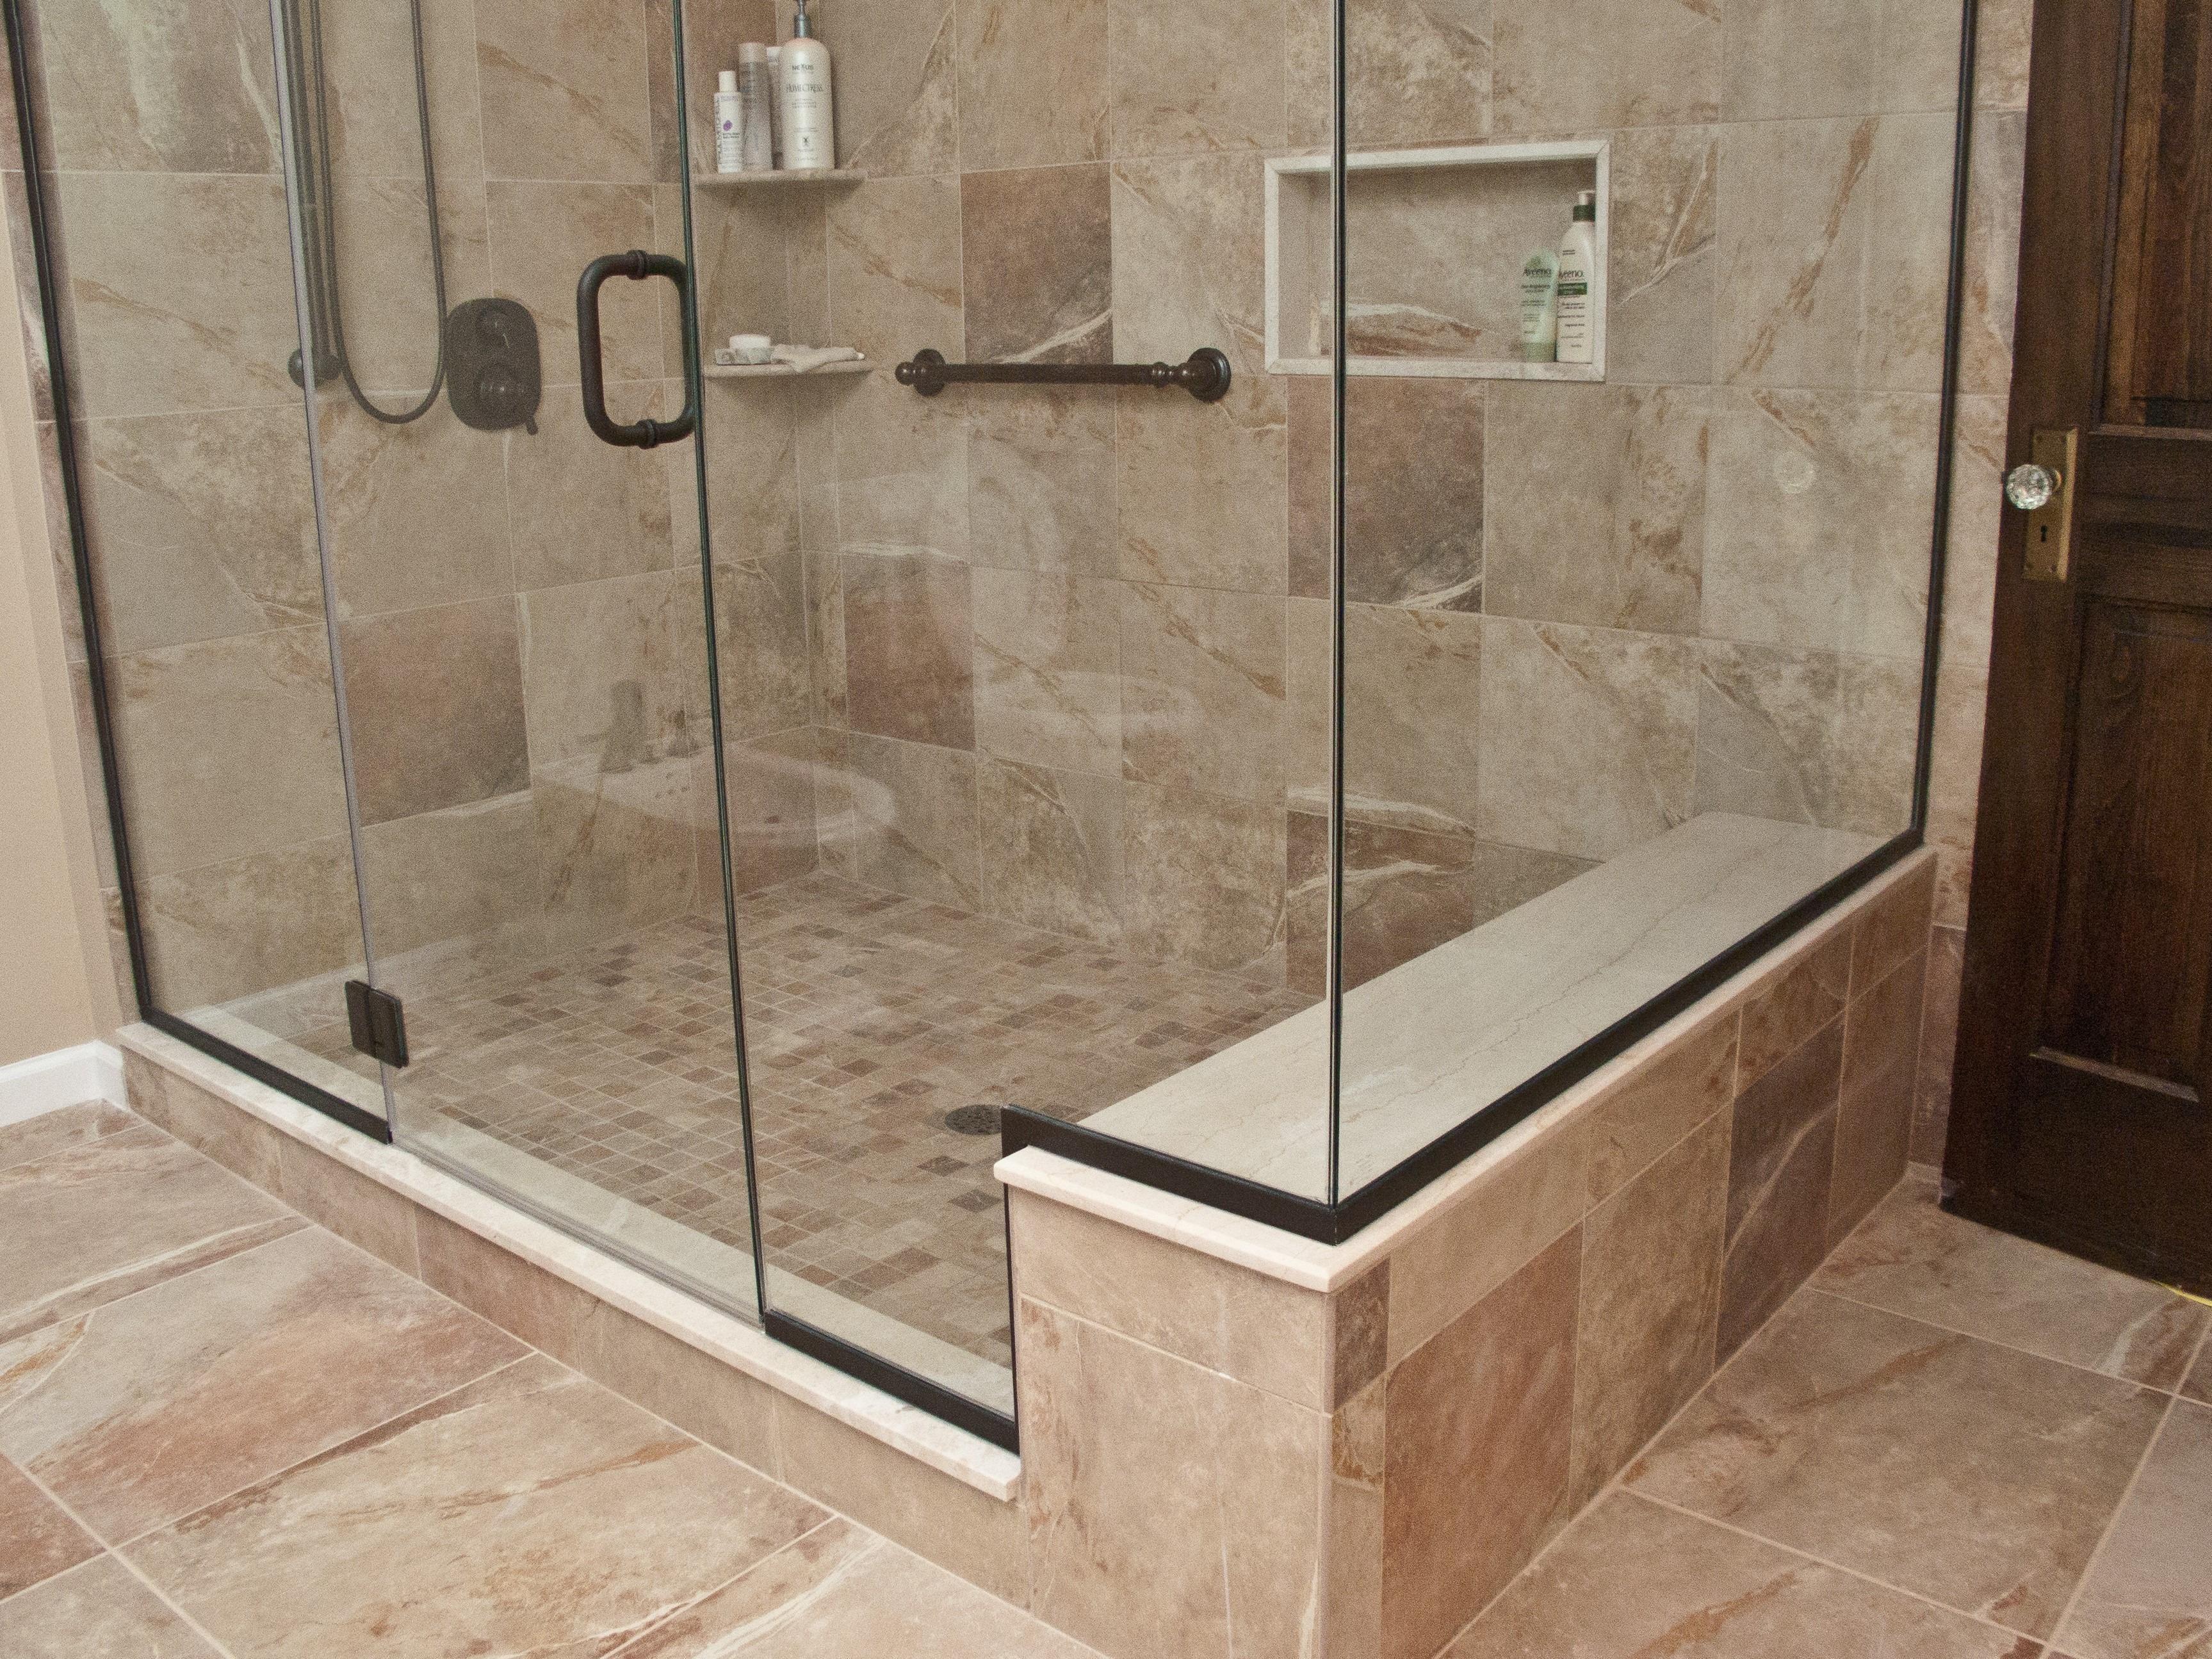 The Water Closet Jamaica Blvd Toms River NJ Remodeling - Bathroom remodeling toms river nj